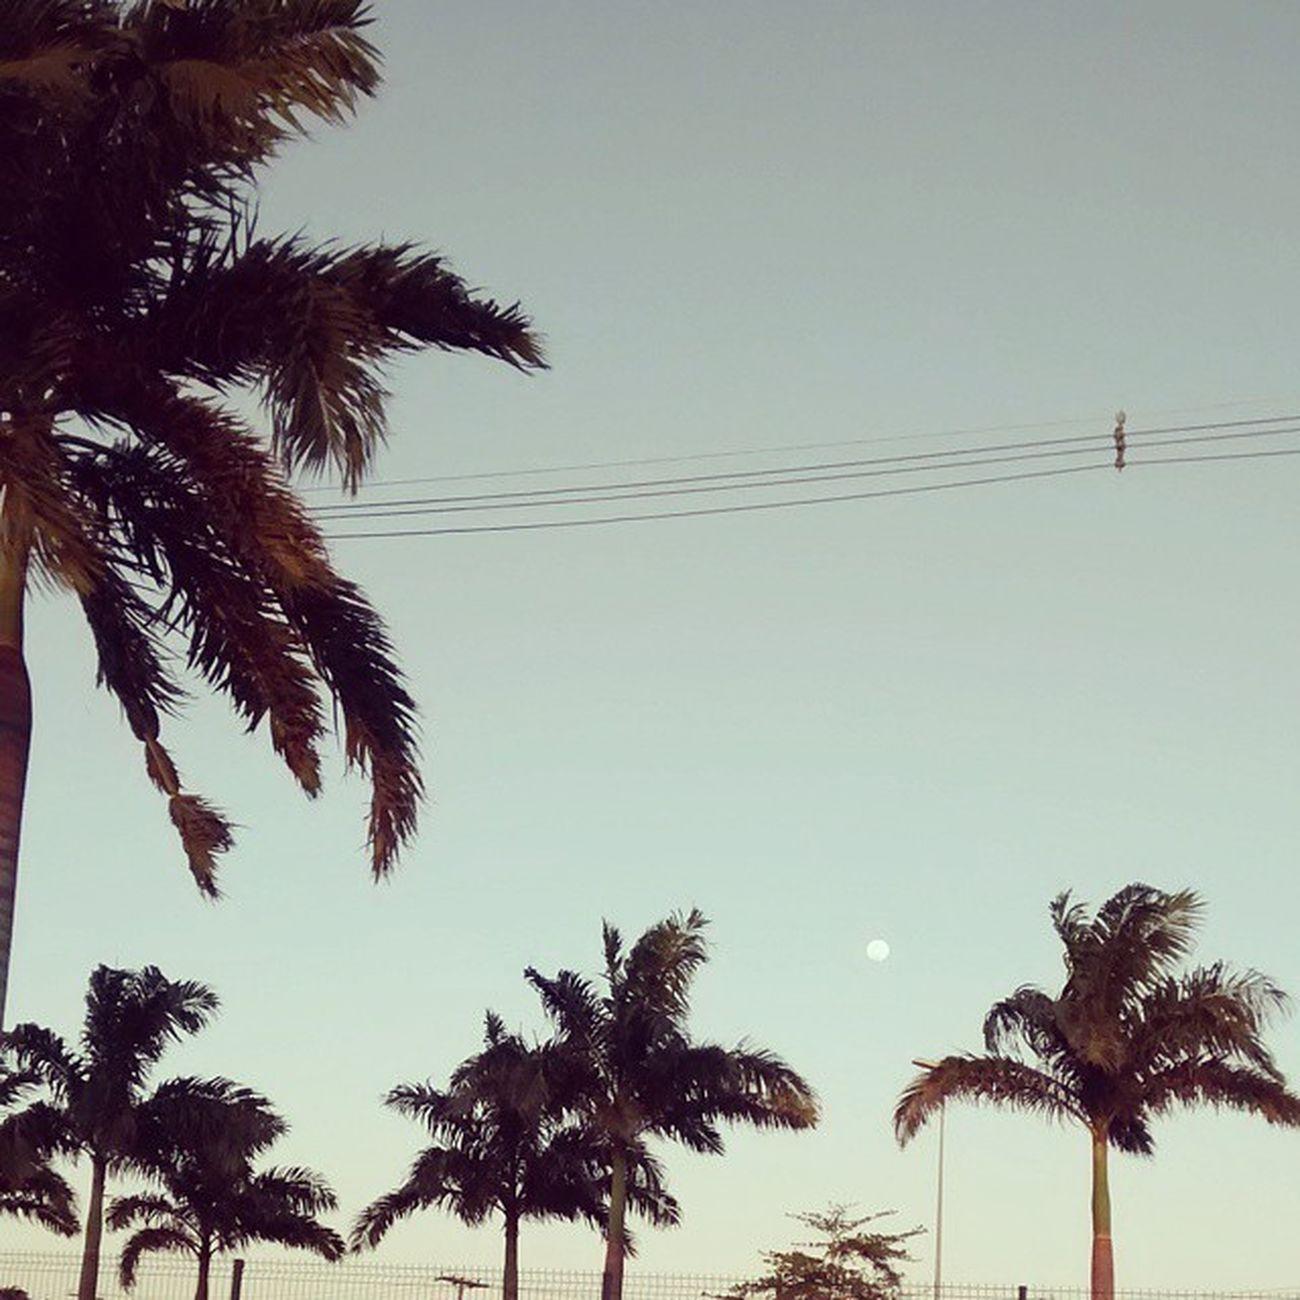 Finzinho de tarde perfeito ? Nature Fotografandooceu Photography Motog